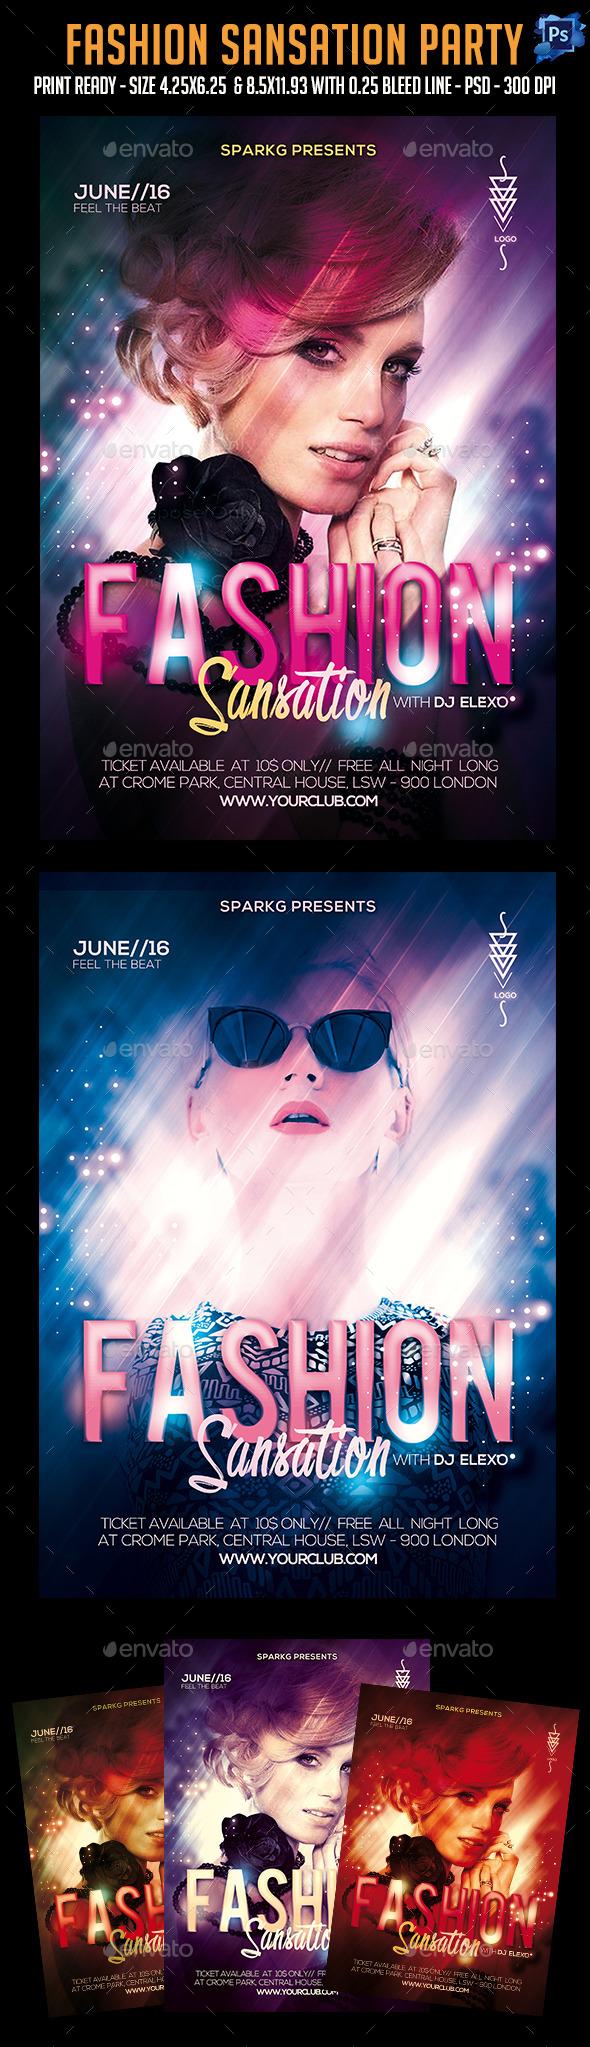 Fashion Sansation Party Flyer - Clubs & Parties Events